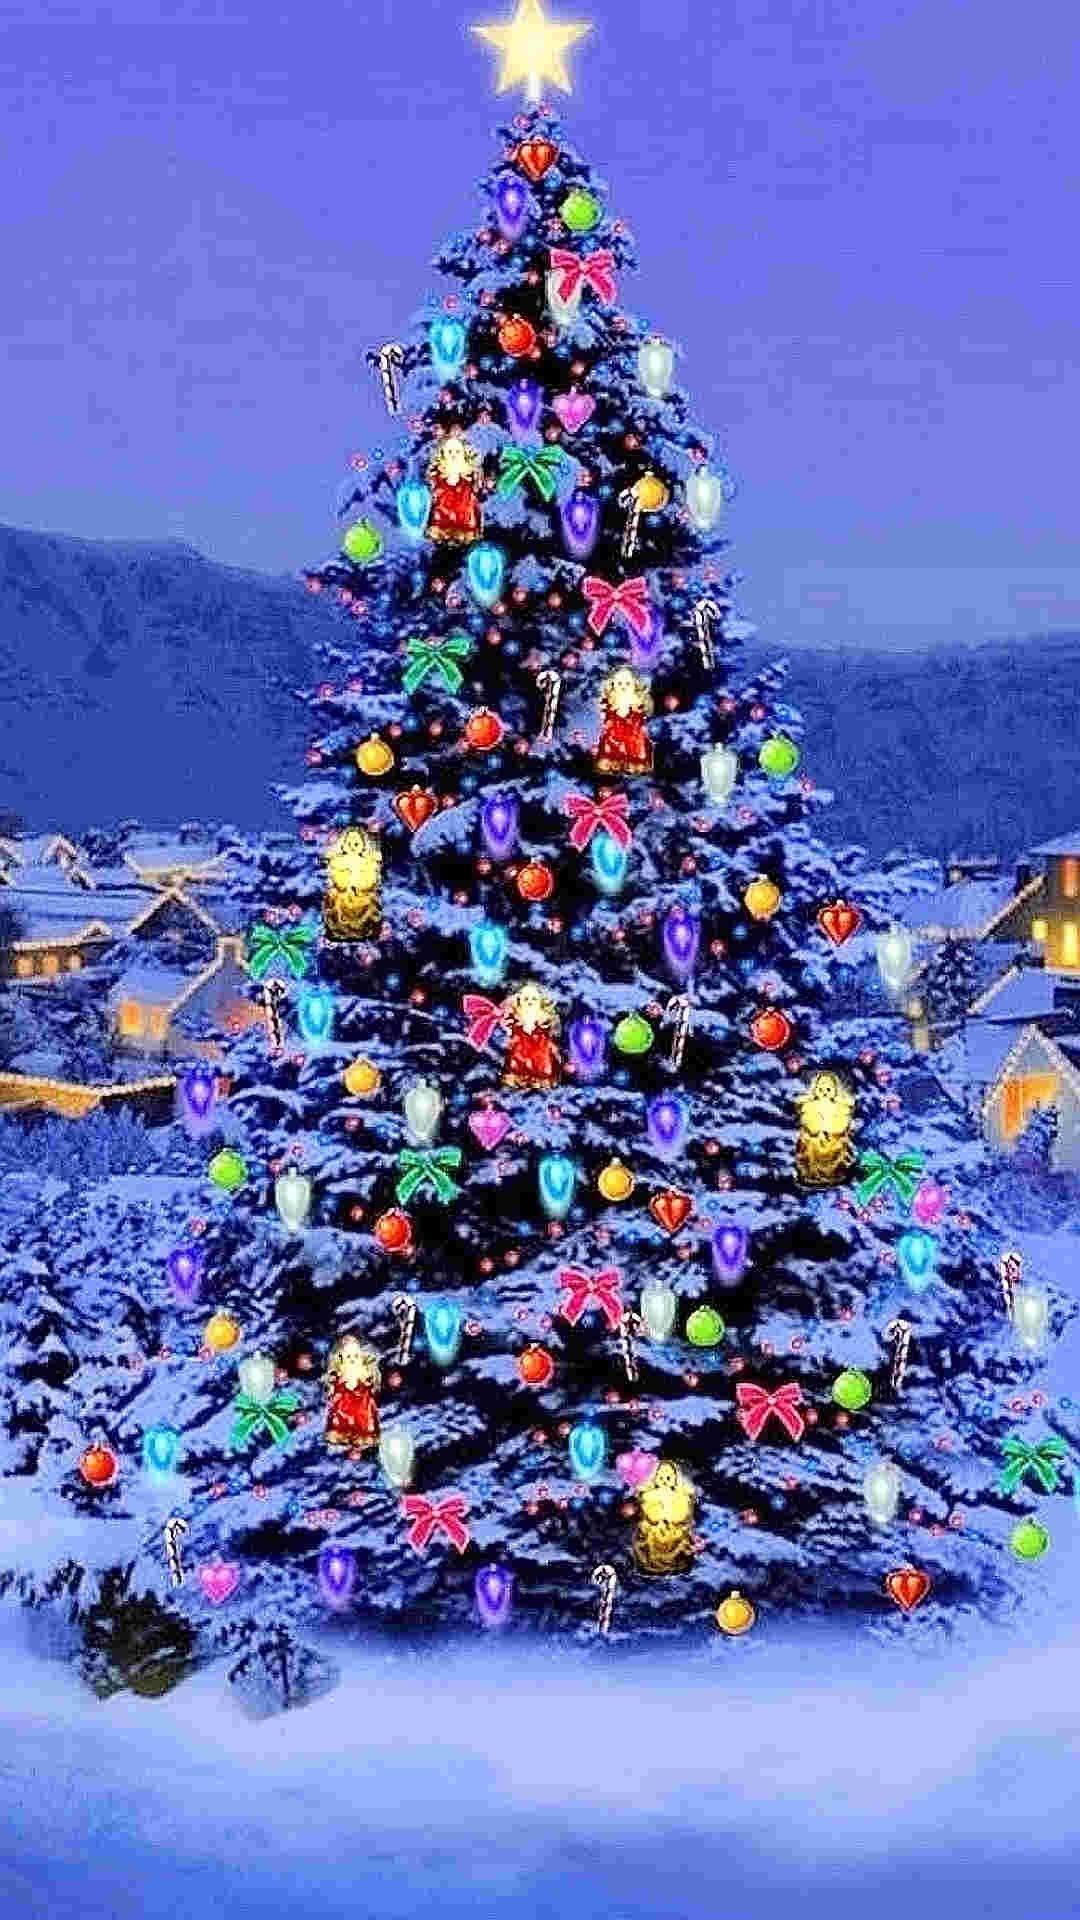 Free Christmas Wallpaper For Phone 707527 Buy Christmas Tree